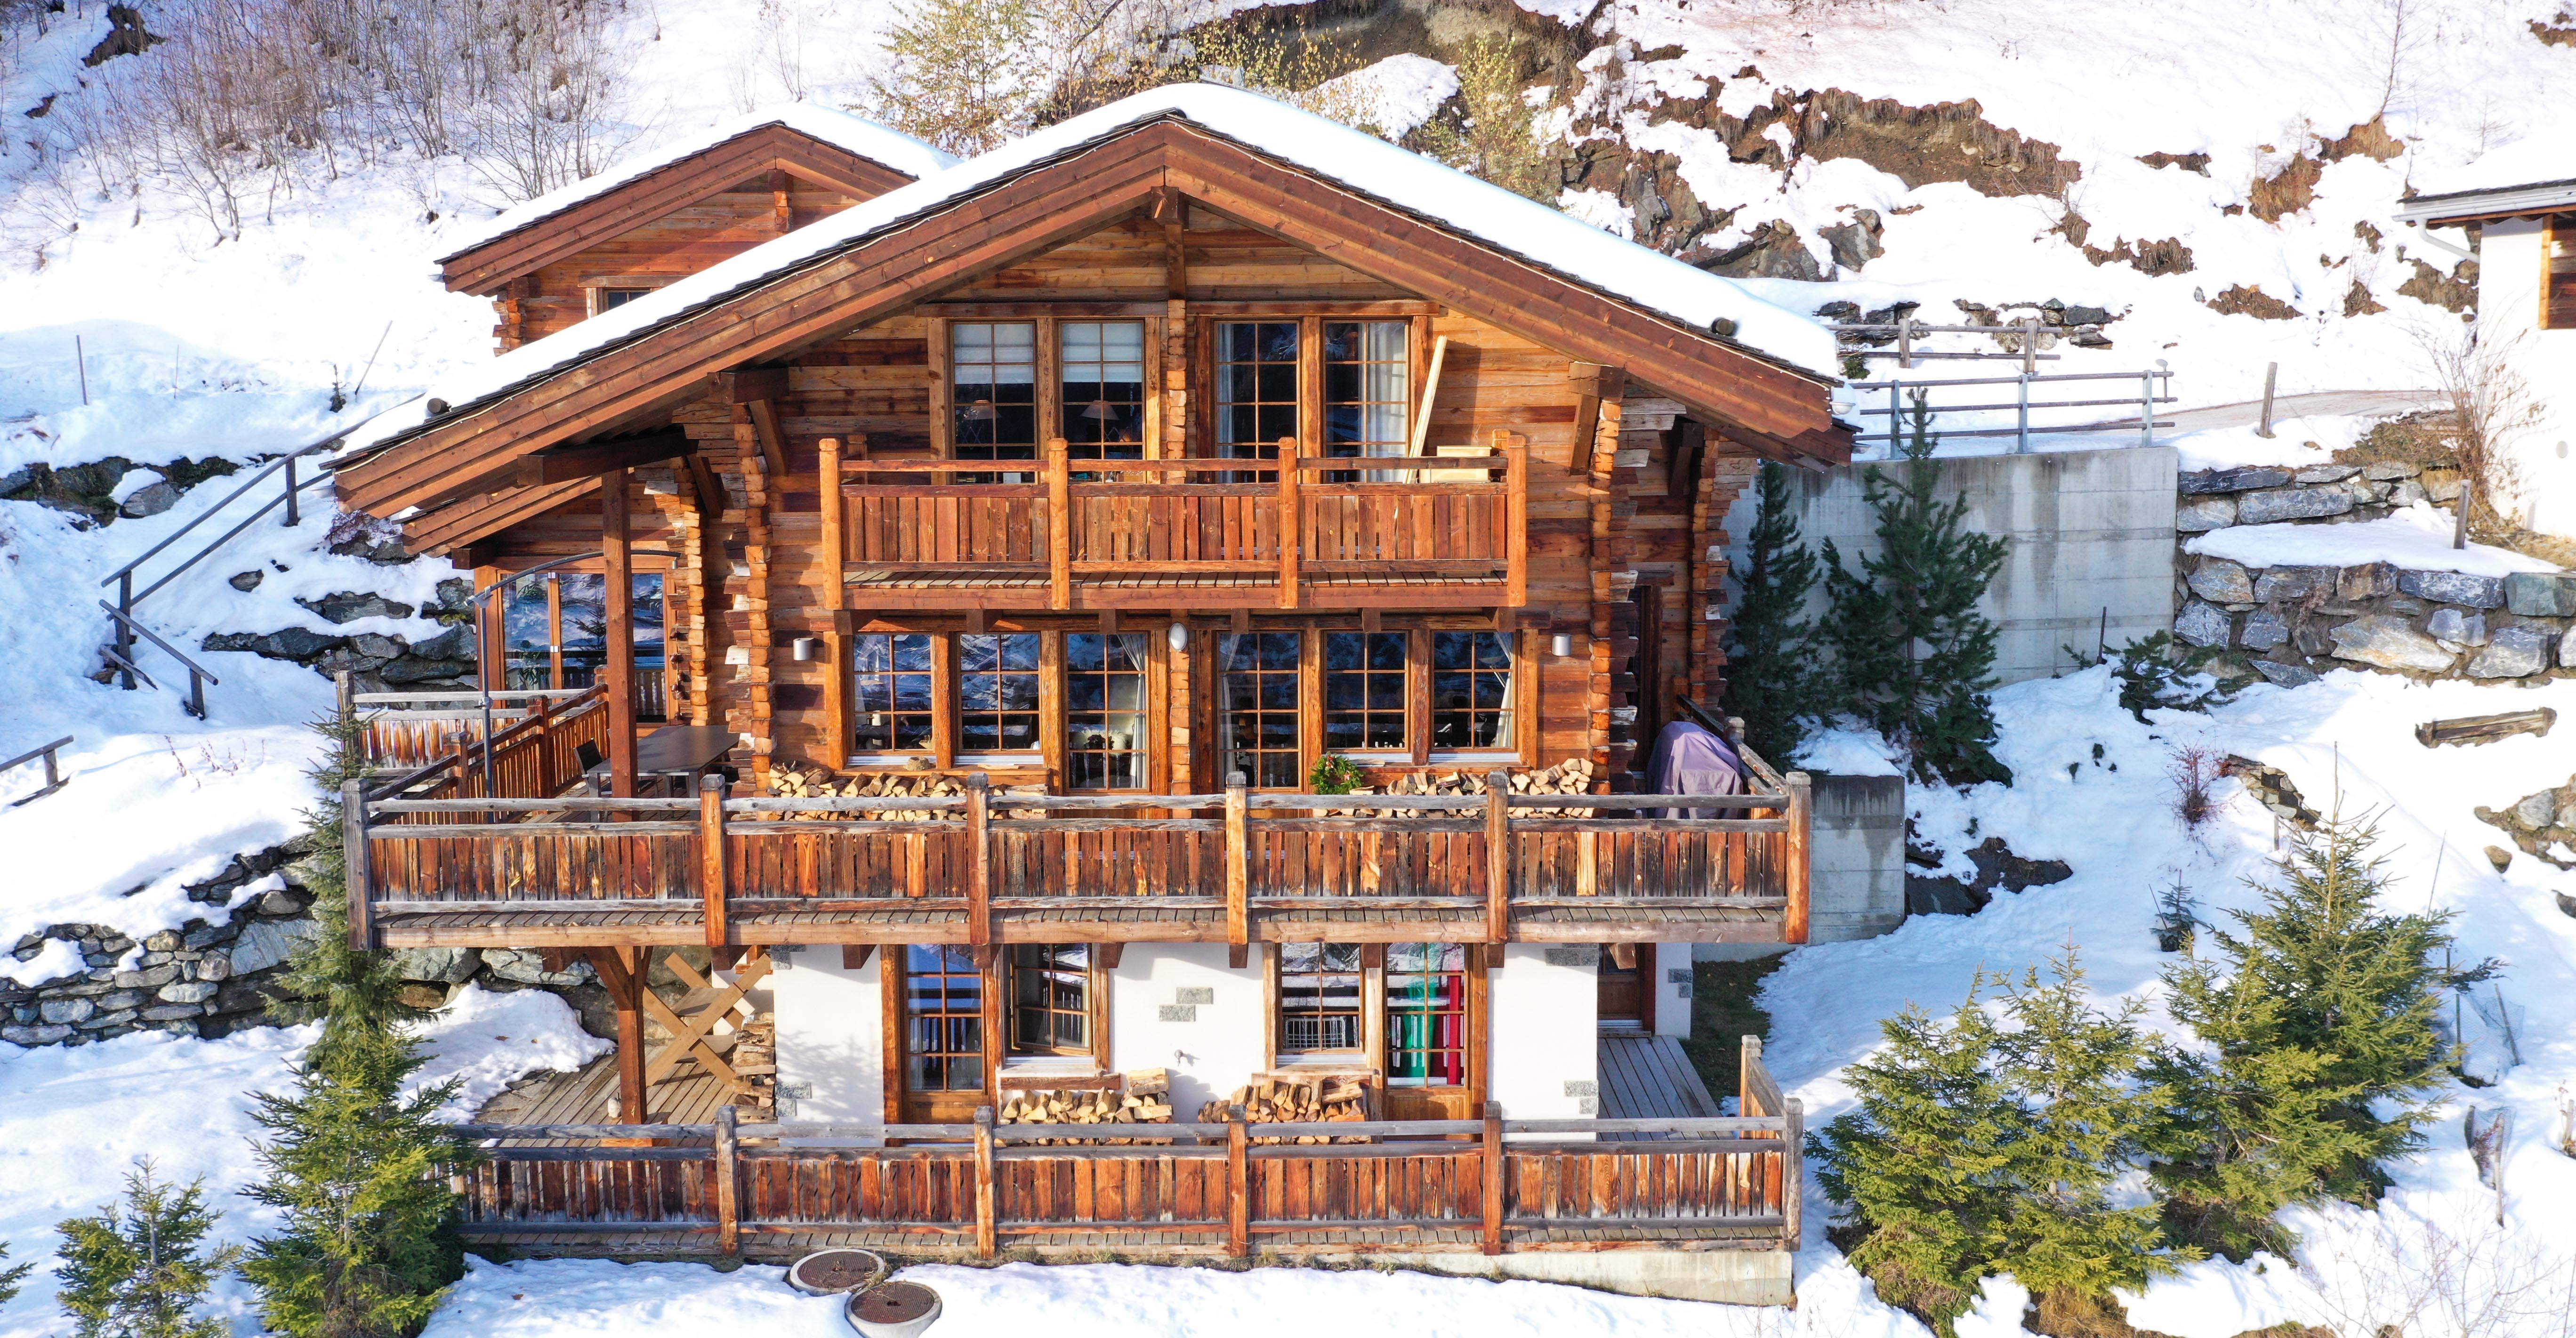 Chalet Far Away Chalet, Switzerland